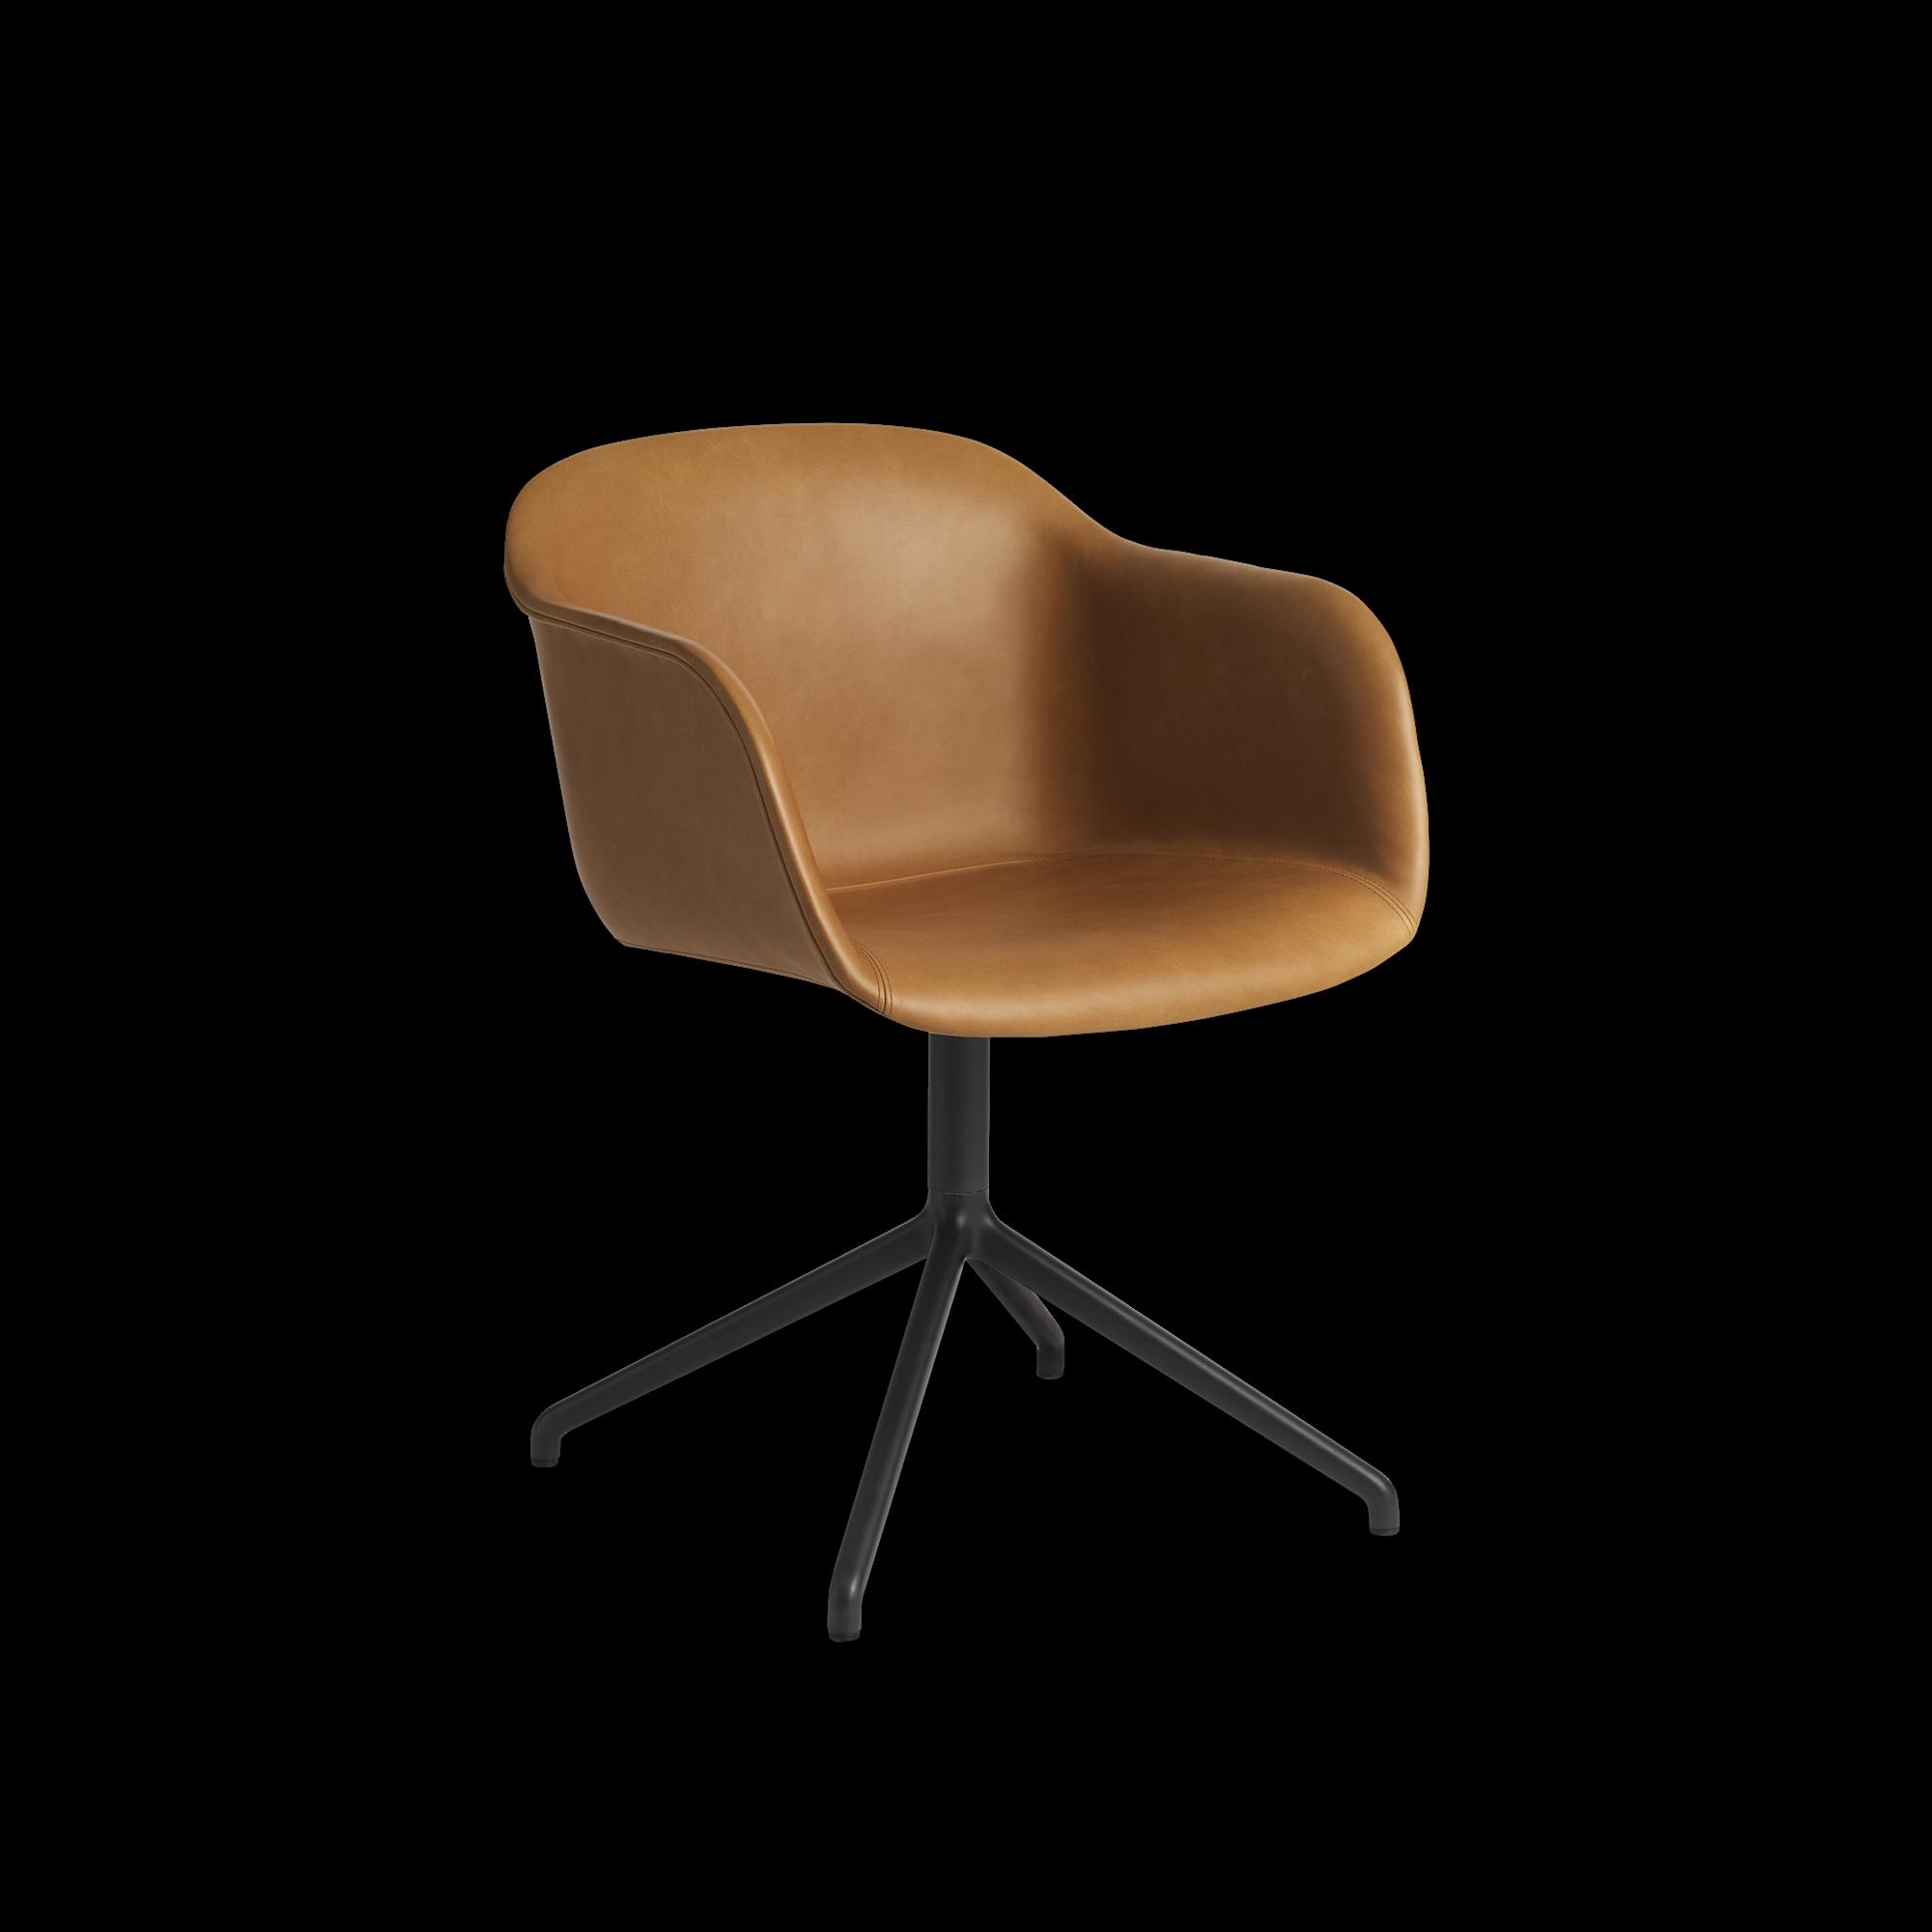 fiber-armchair-swivel-base-master-fiber-armchair-swivel-